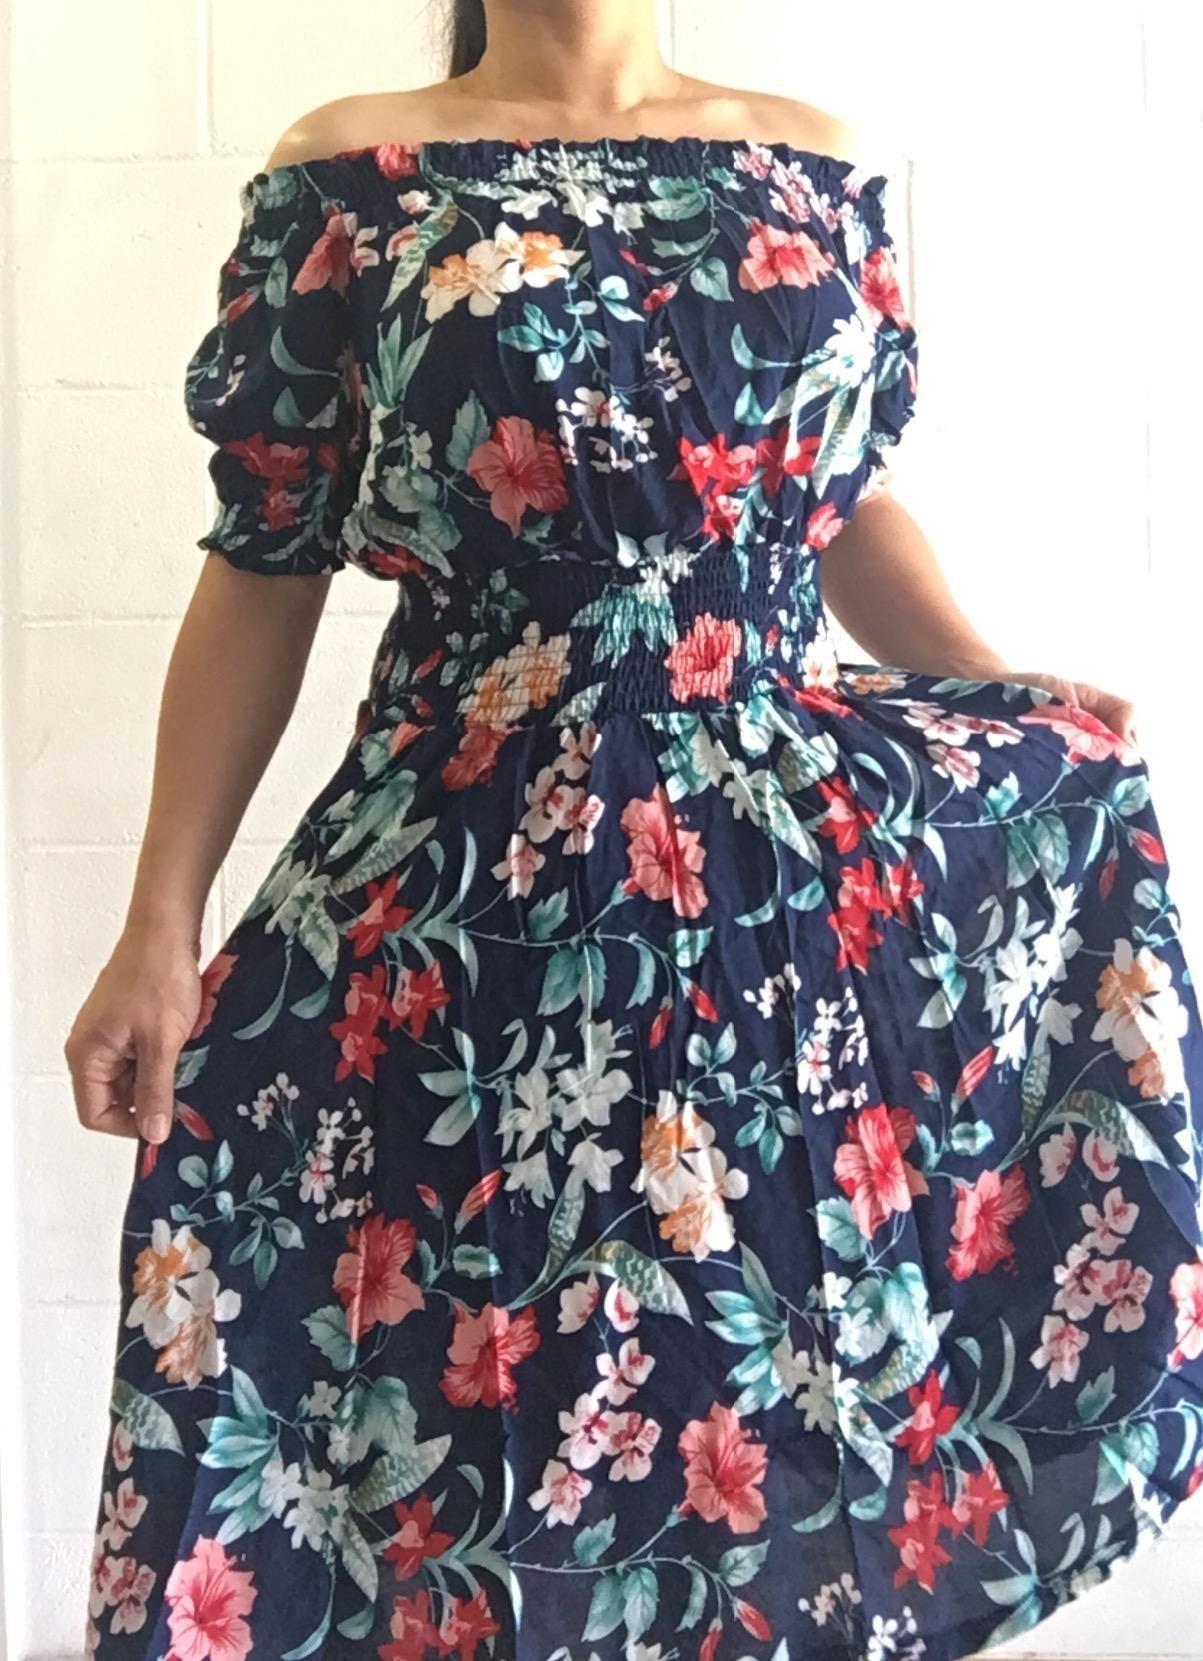 Cheap dresses 20 dollars under zit